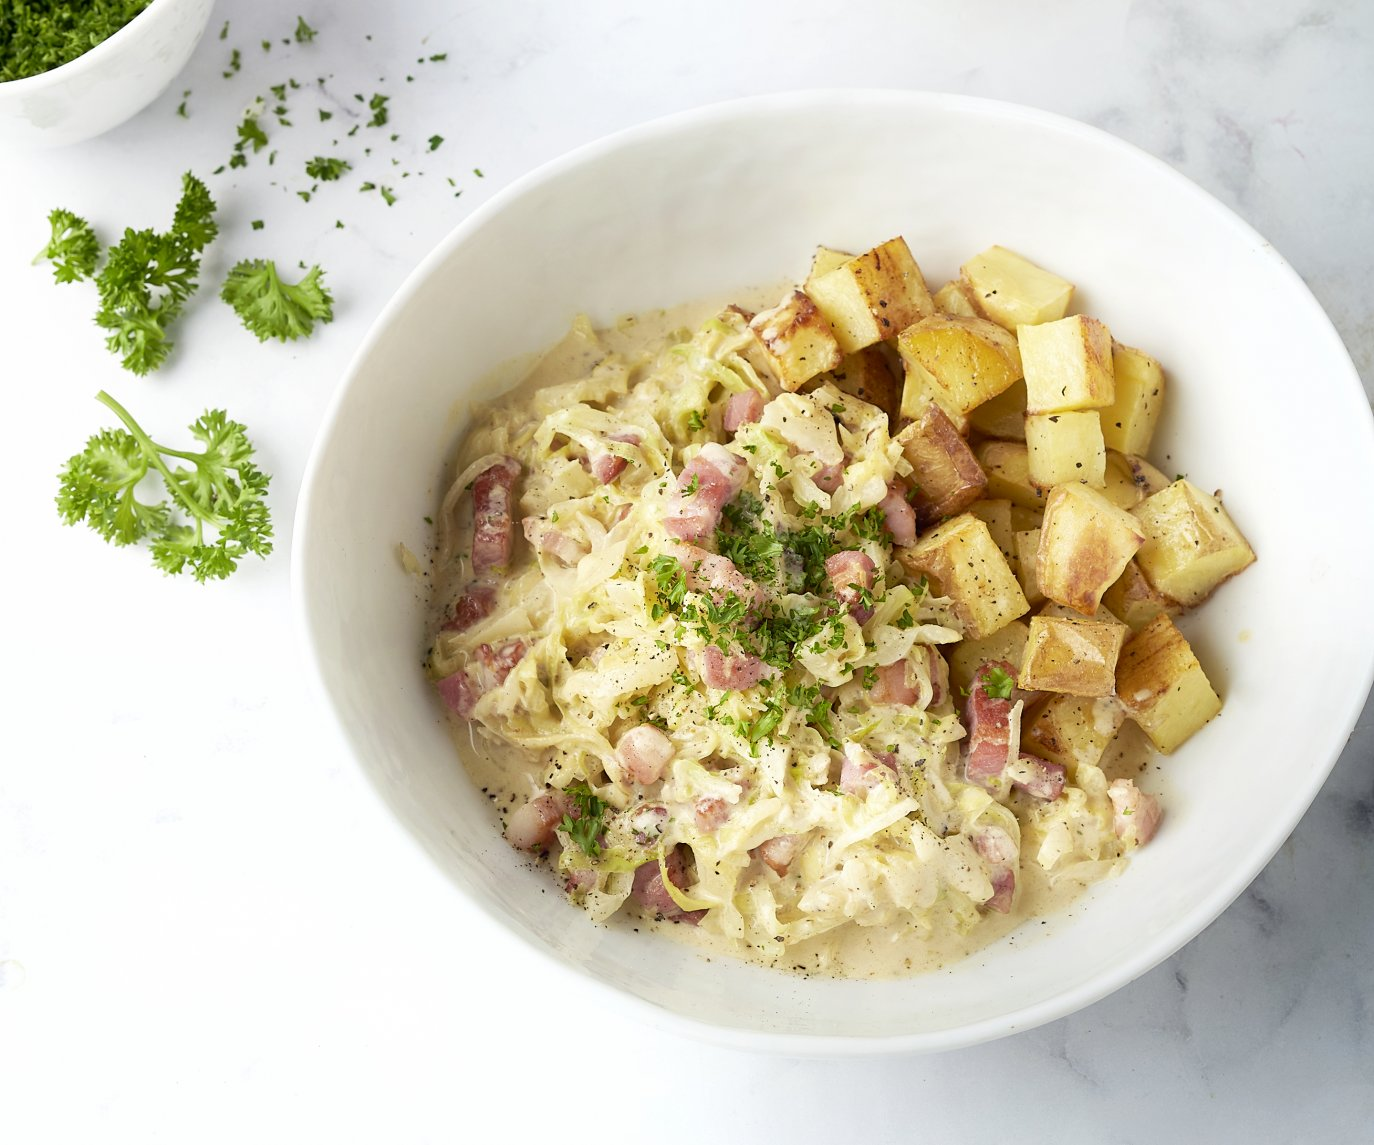 Spitskool met gebakken spekjes en geroosterde aardappel